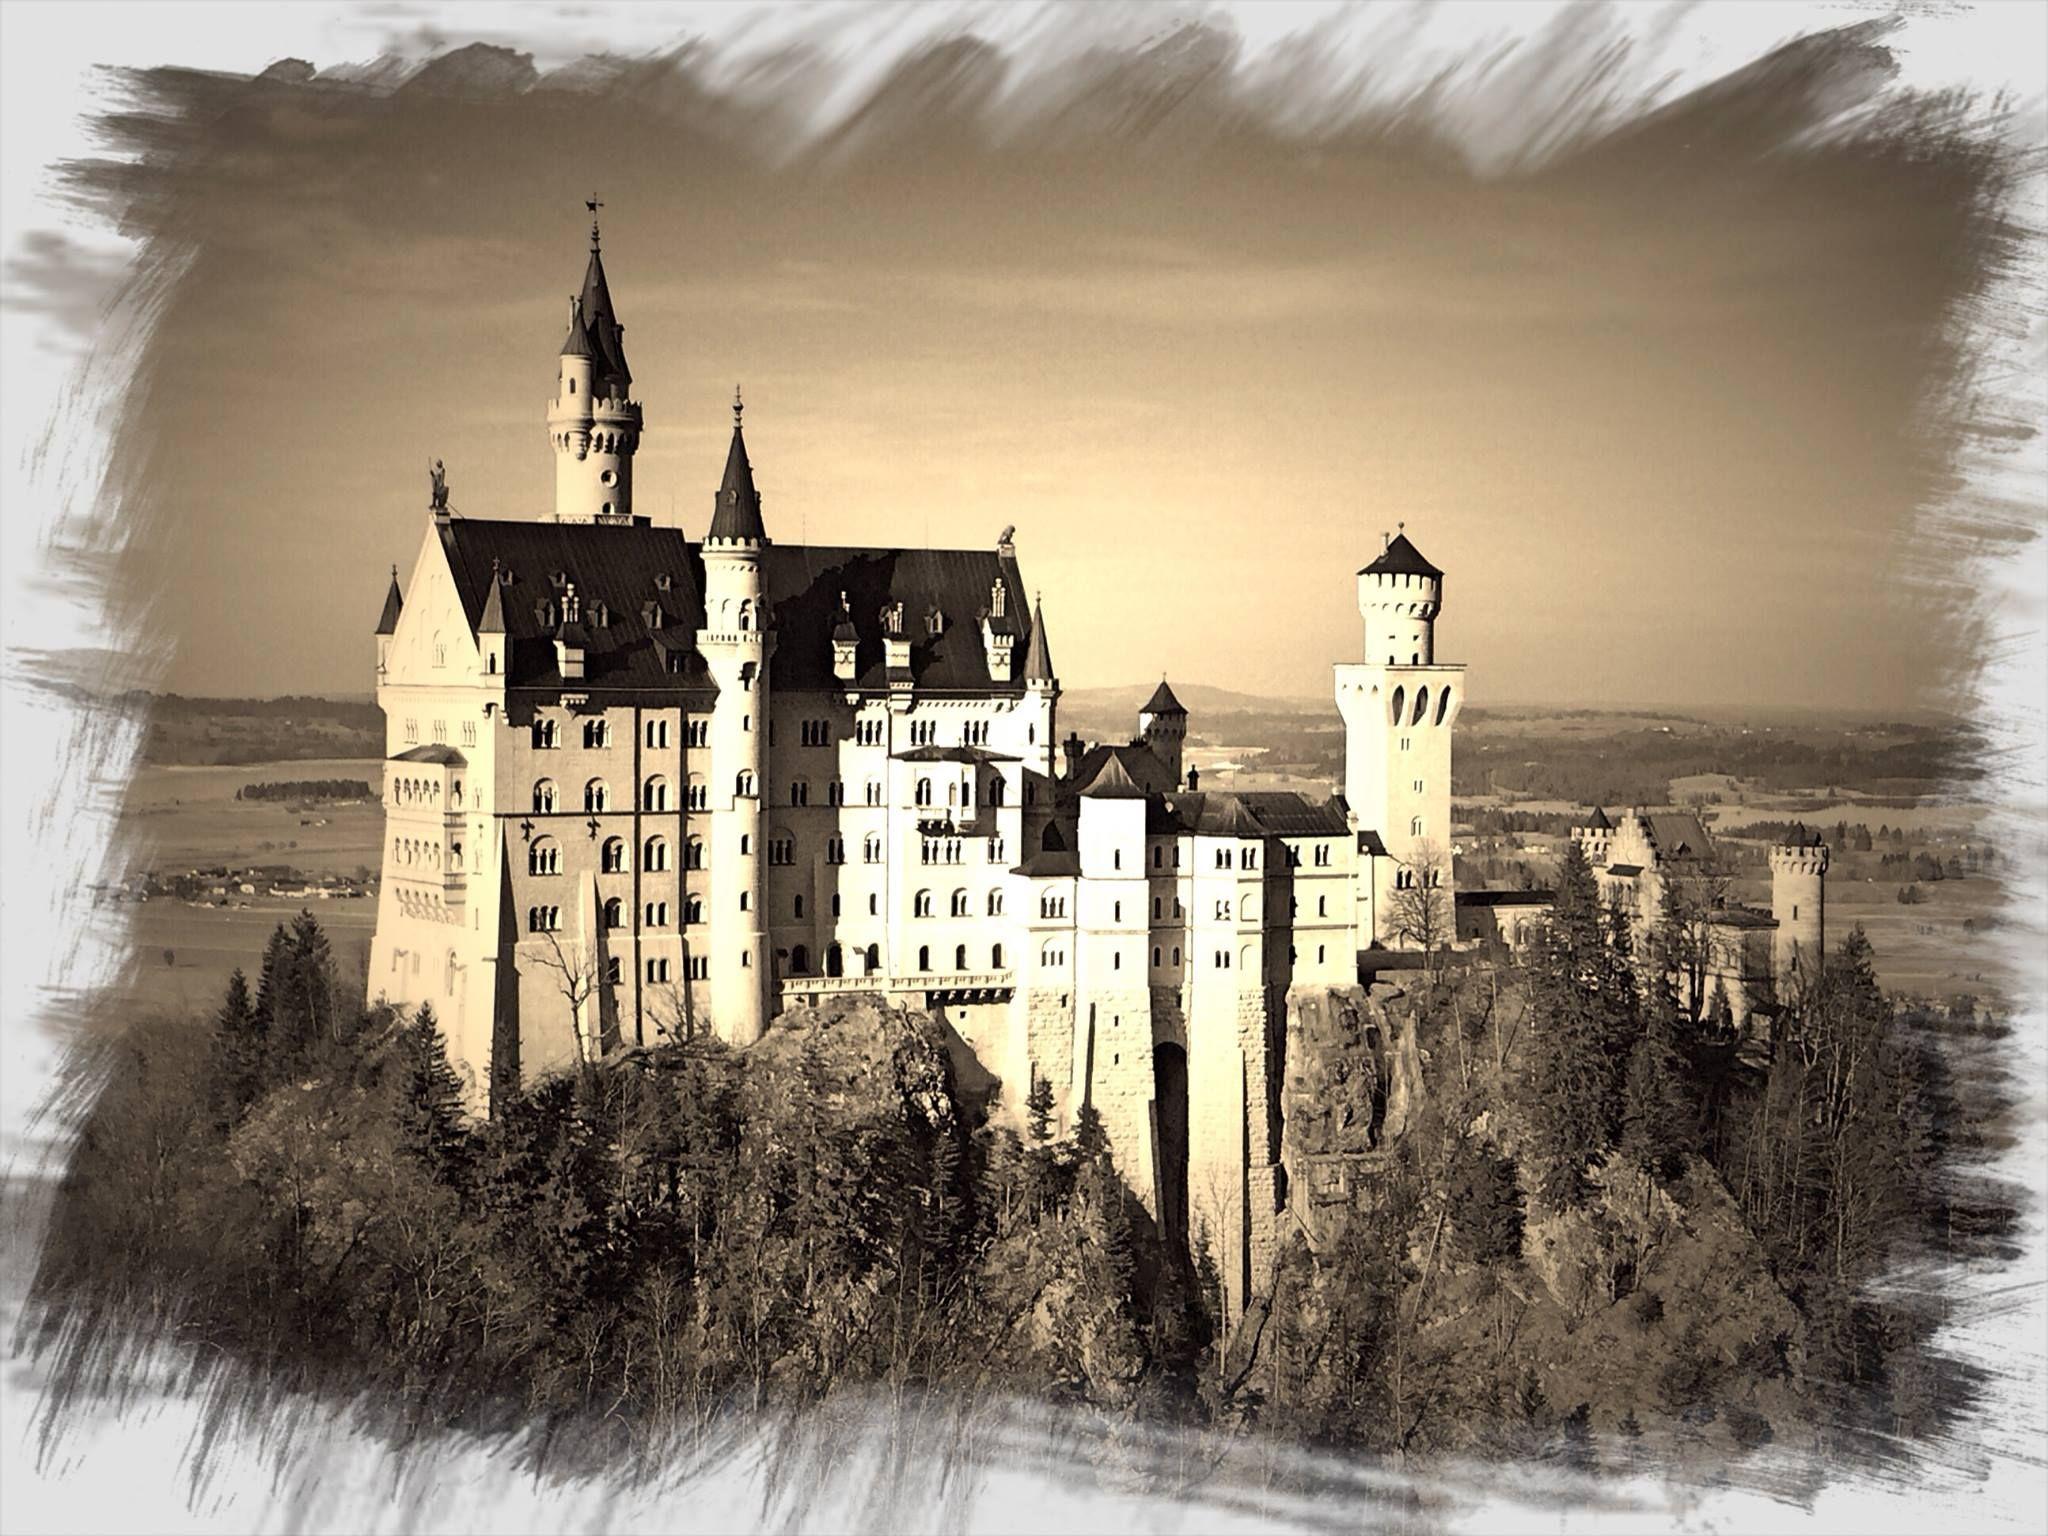 Travel Neuschwanstein Castle Since The Year 1868 King Ludwig Ii Had His Fairy Castle Neuschwanstein Built As A Romantic Fortress On Neuschwanstein Ludwig